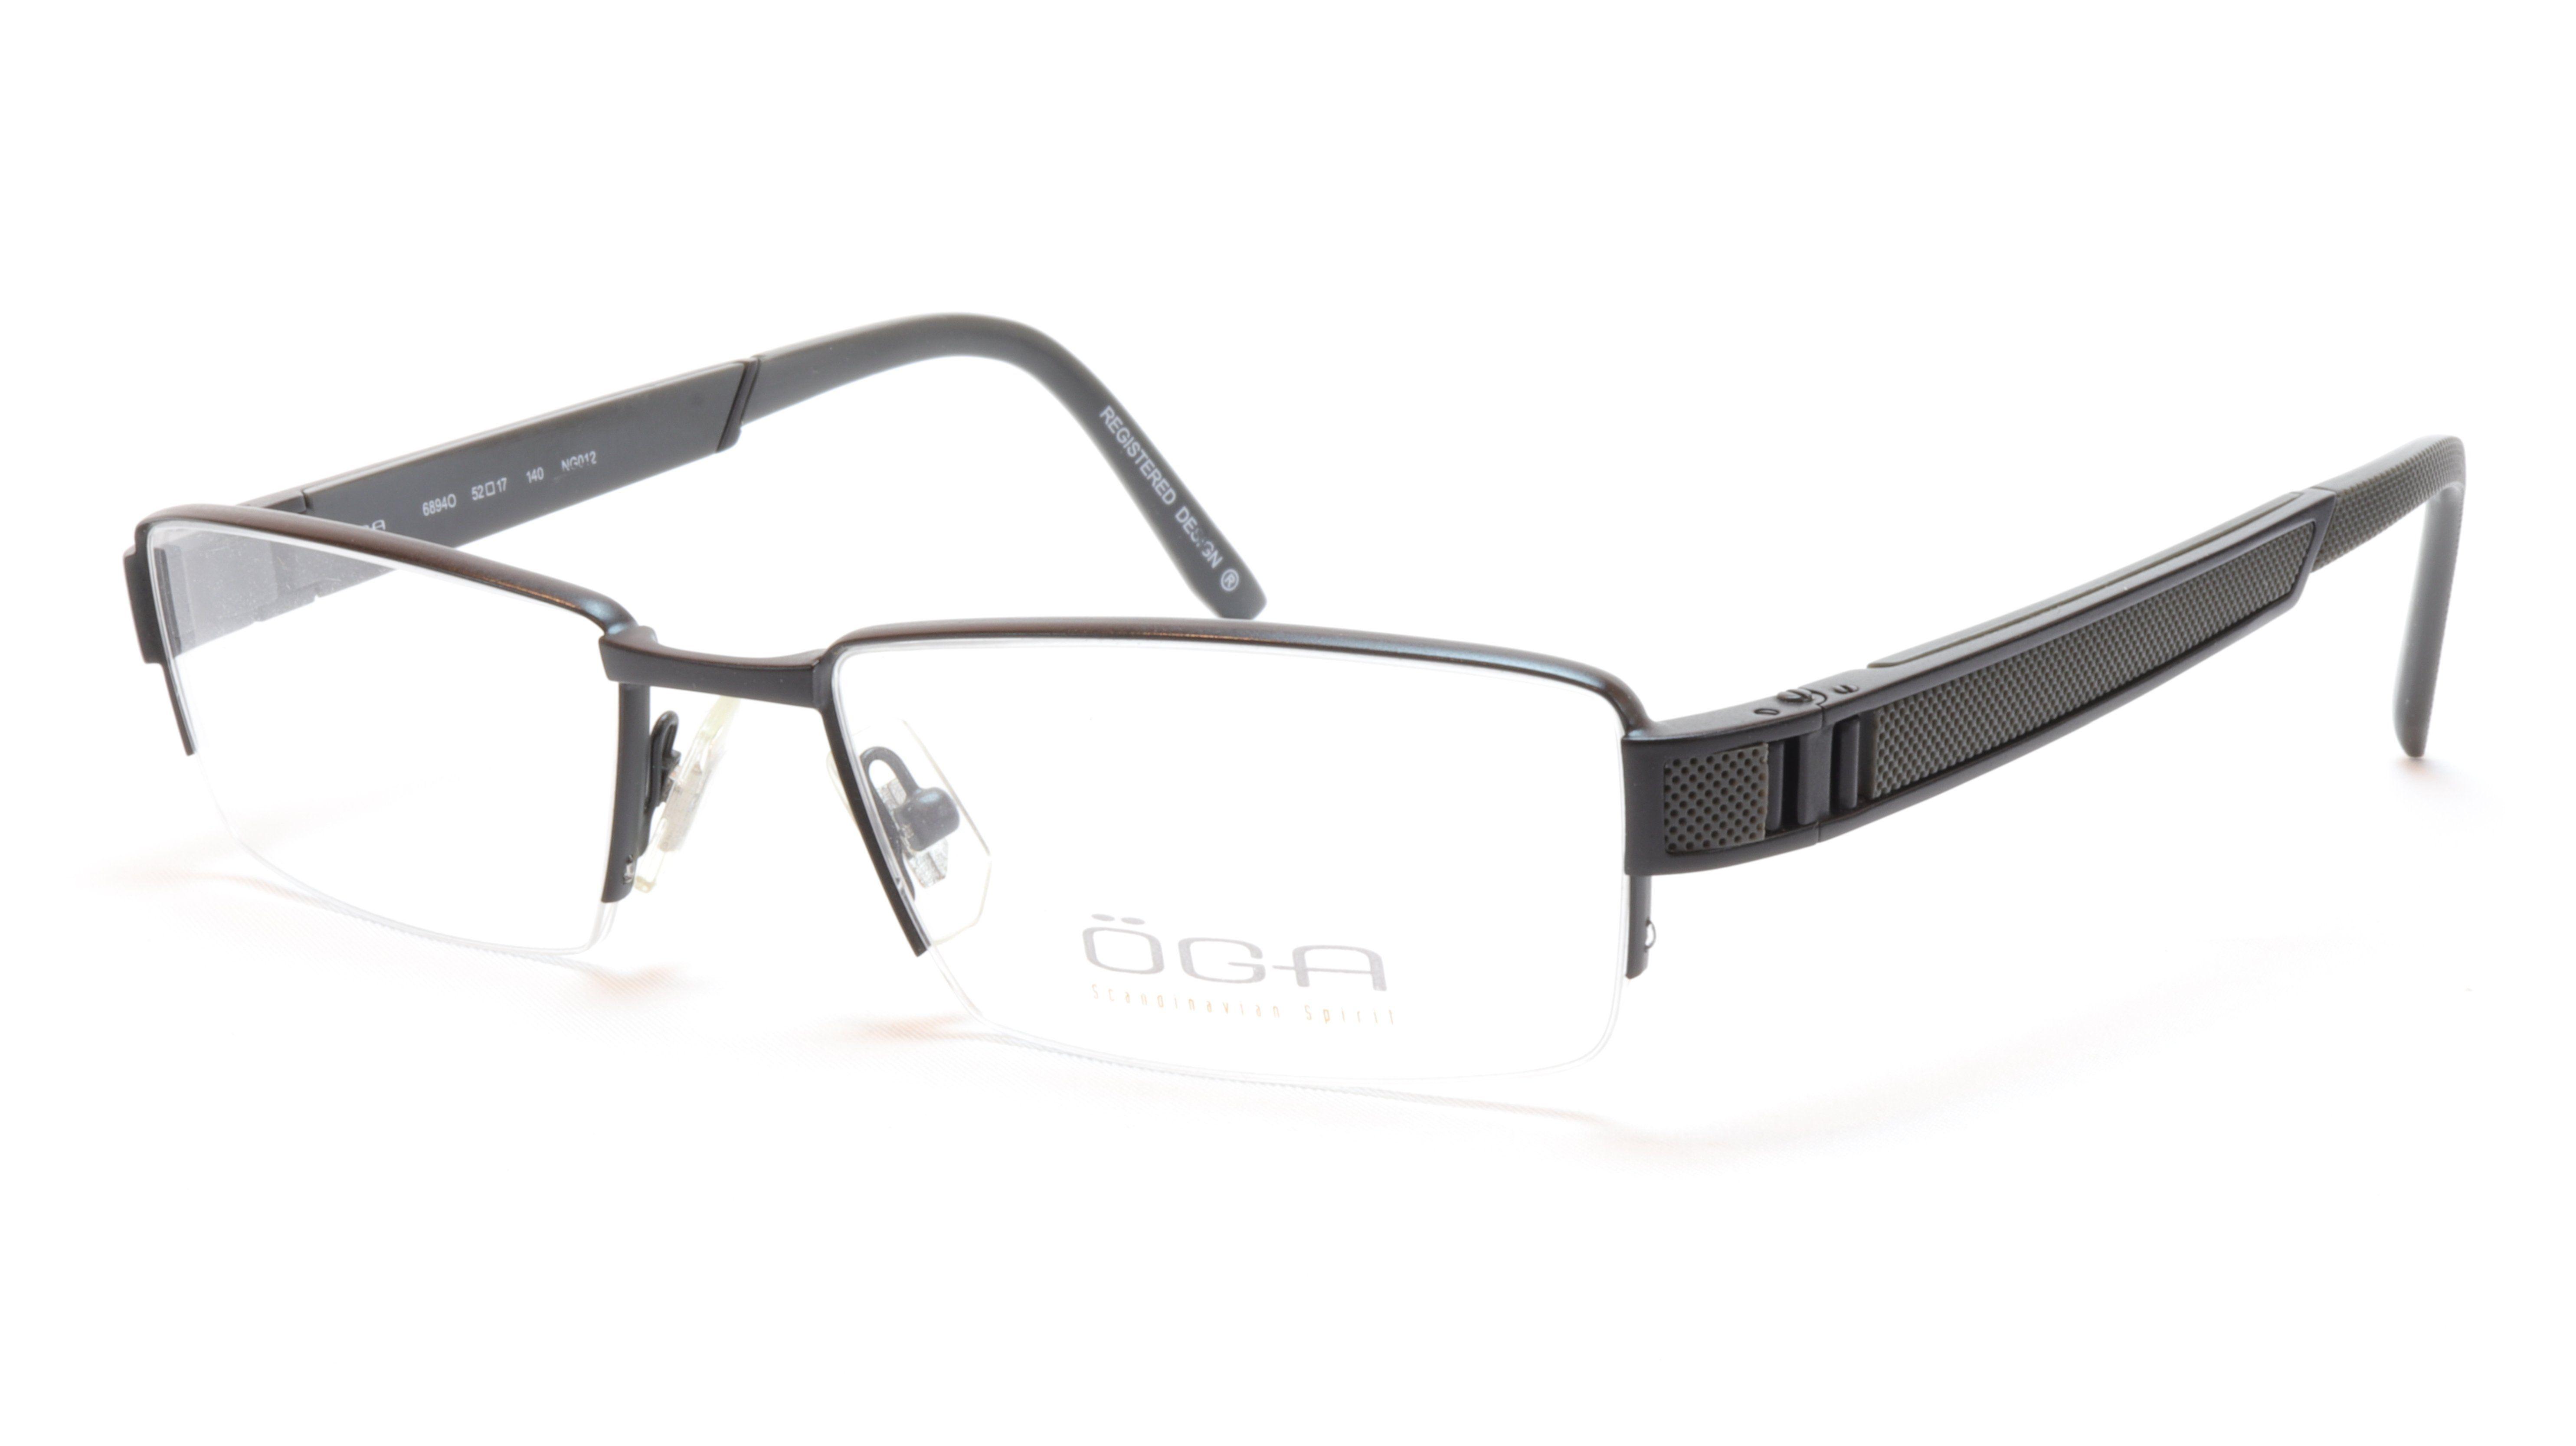 75f58e292b8b OGA Morel Eyeglasses Frame 68940 NG012 Acetate Metal Black France 52-17-140,